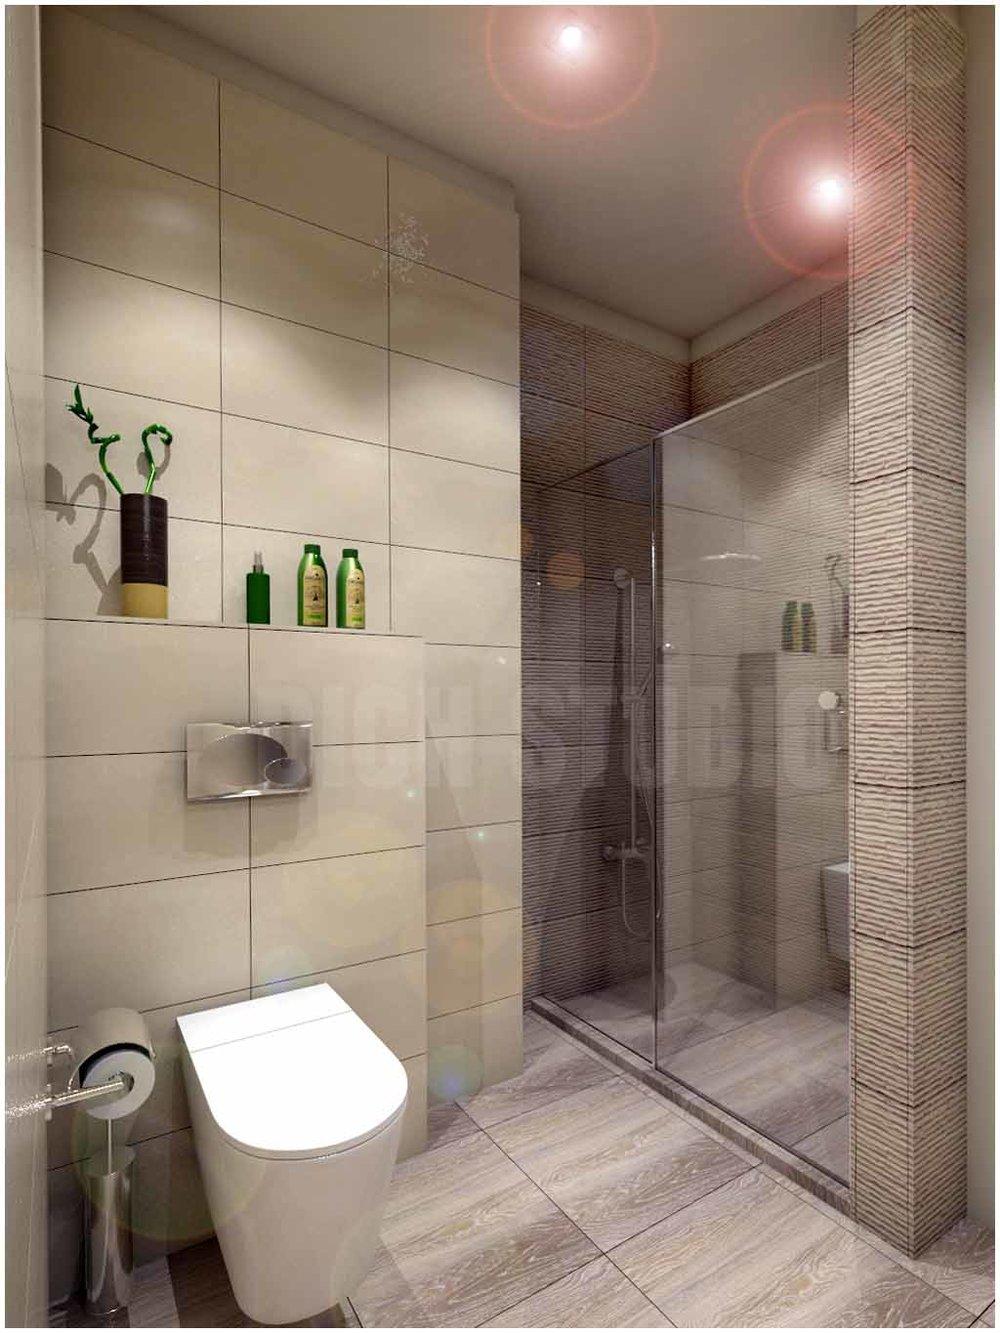 dich_studio_bathroom_trends11.jpg